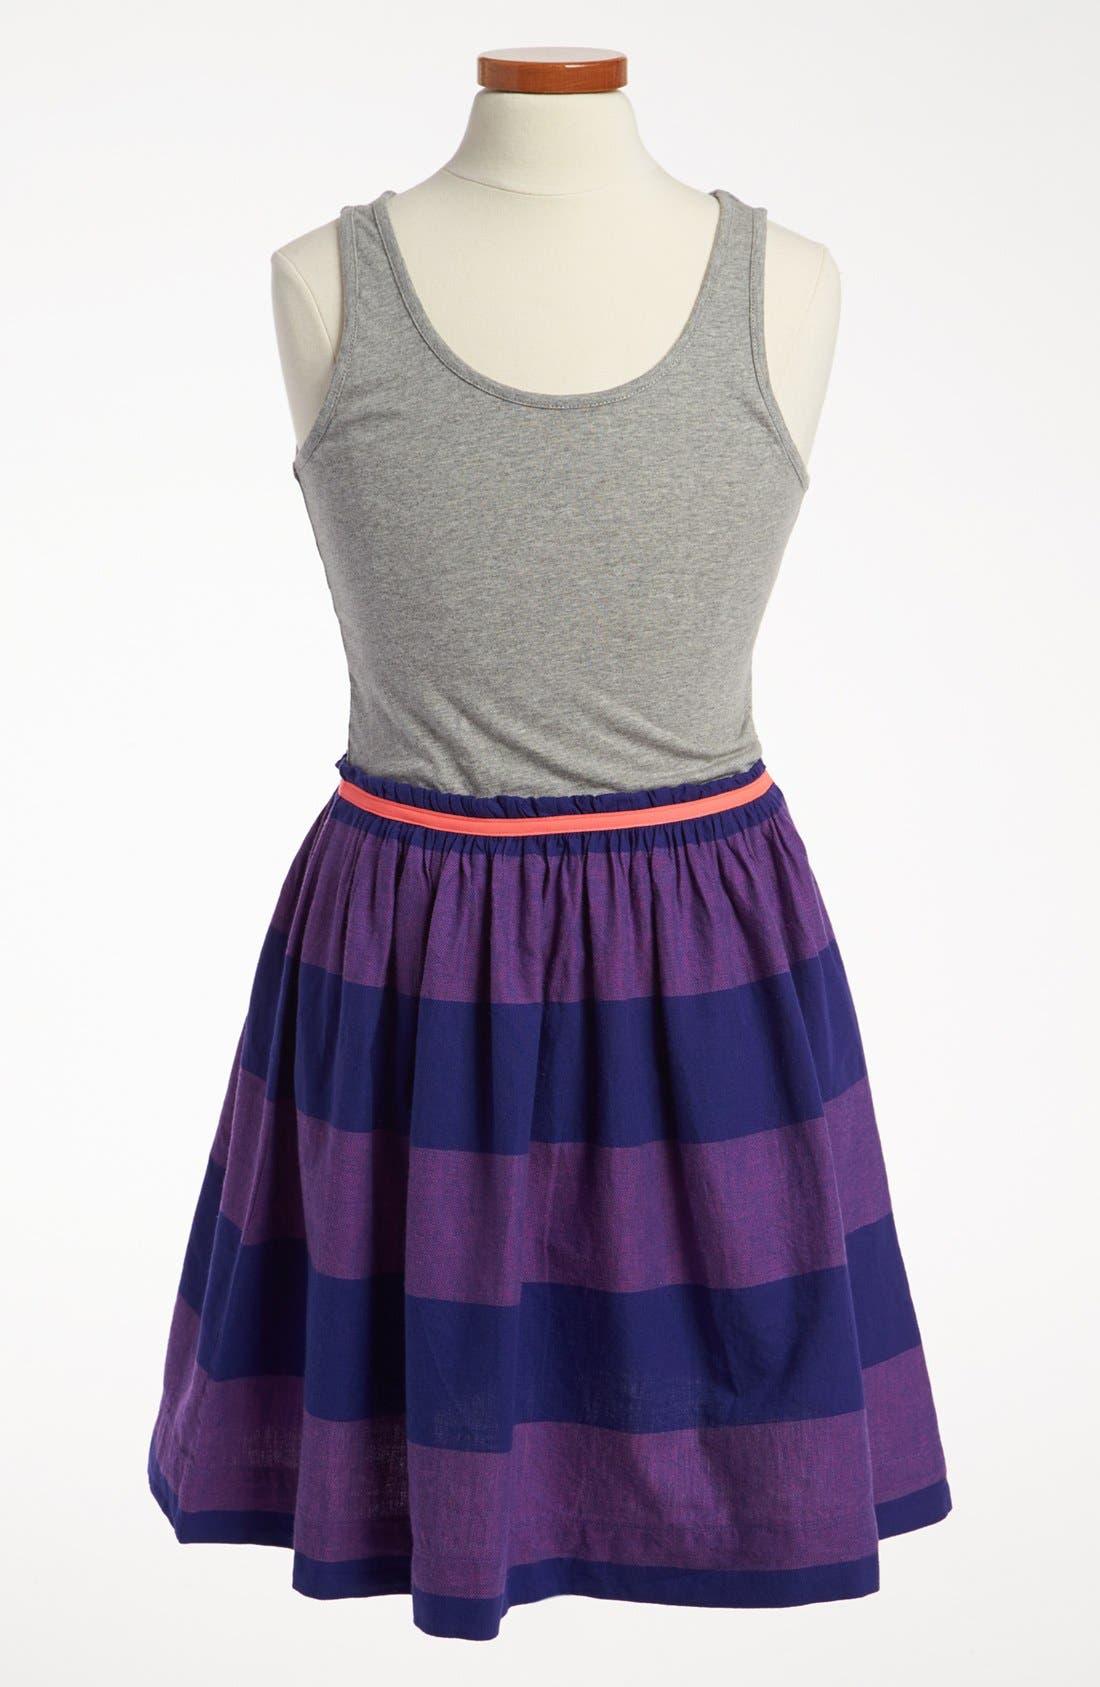 Alternate Image 1 Selected - Johnnie b 'Vest' Dress (Big Girls)